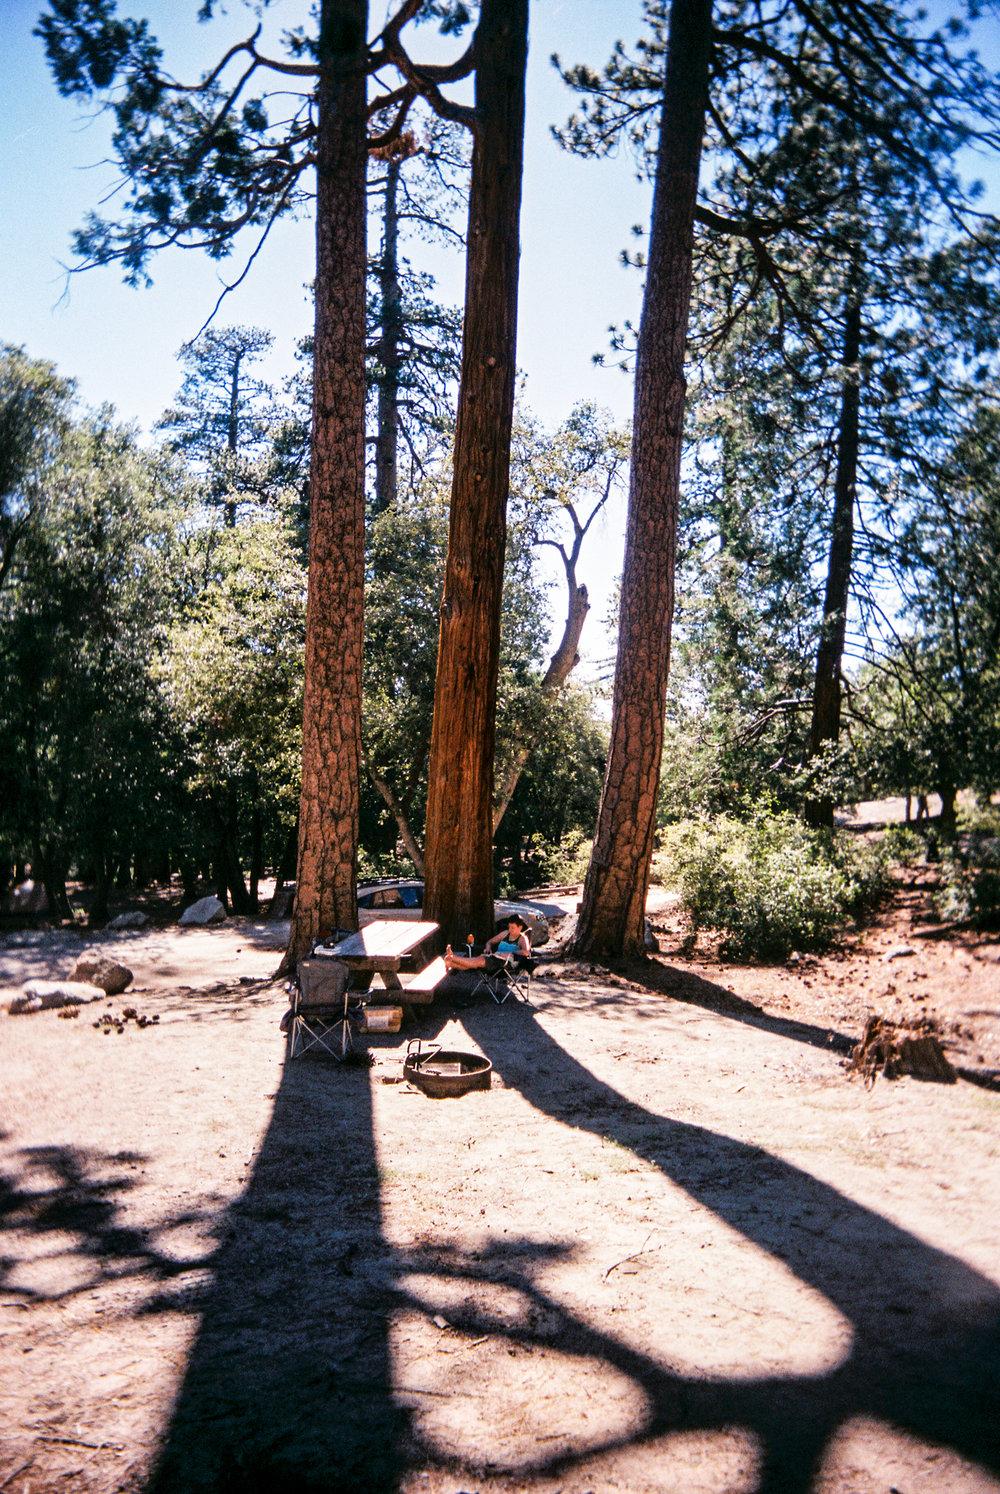 Posted 24 Idyllwild - camping.jpg